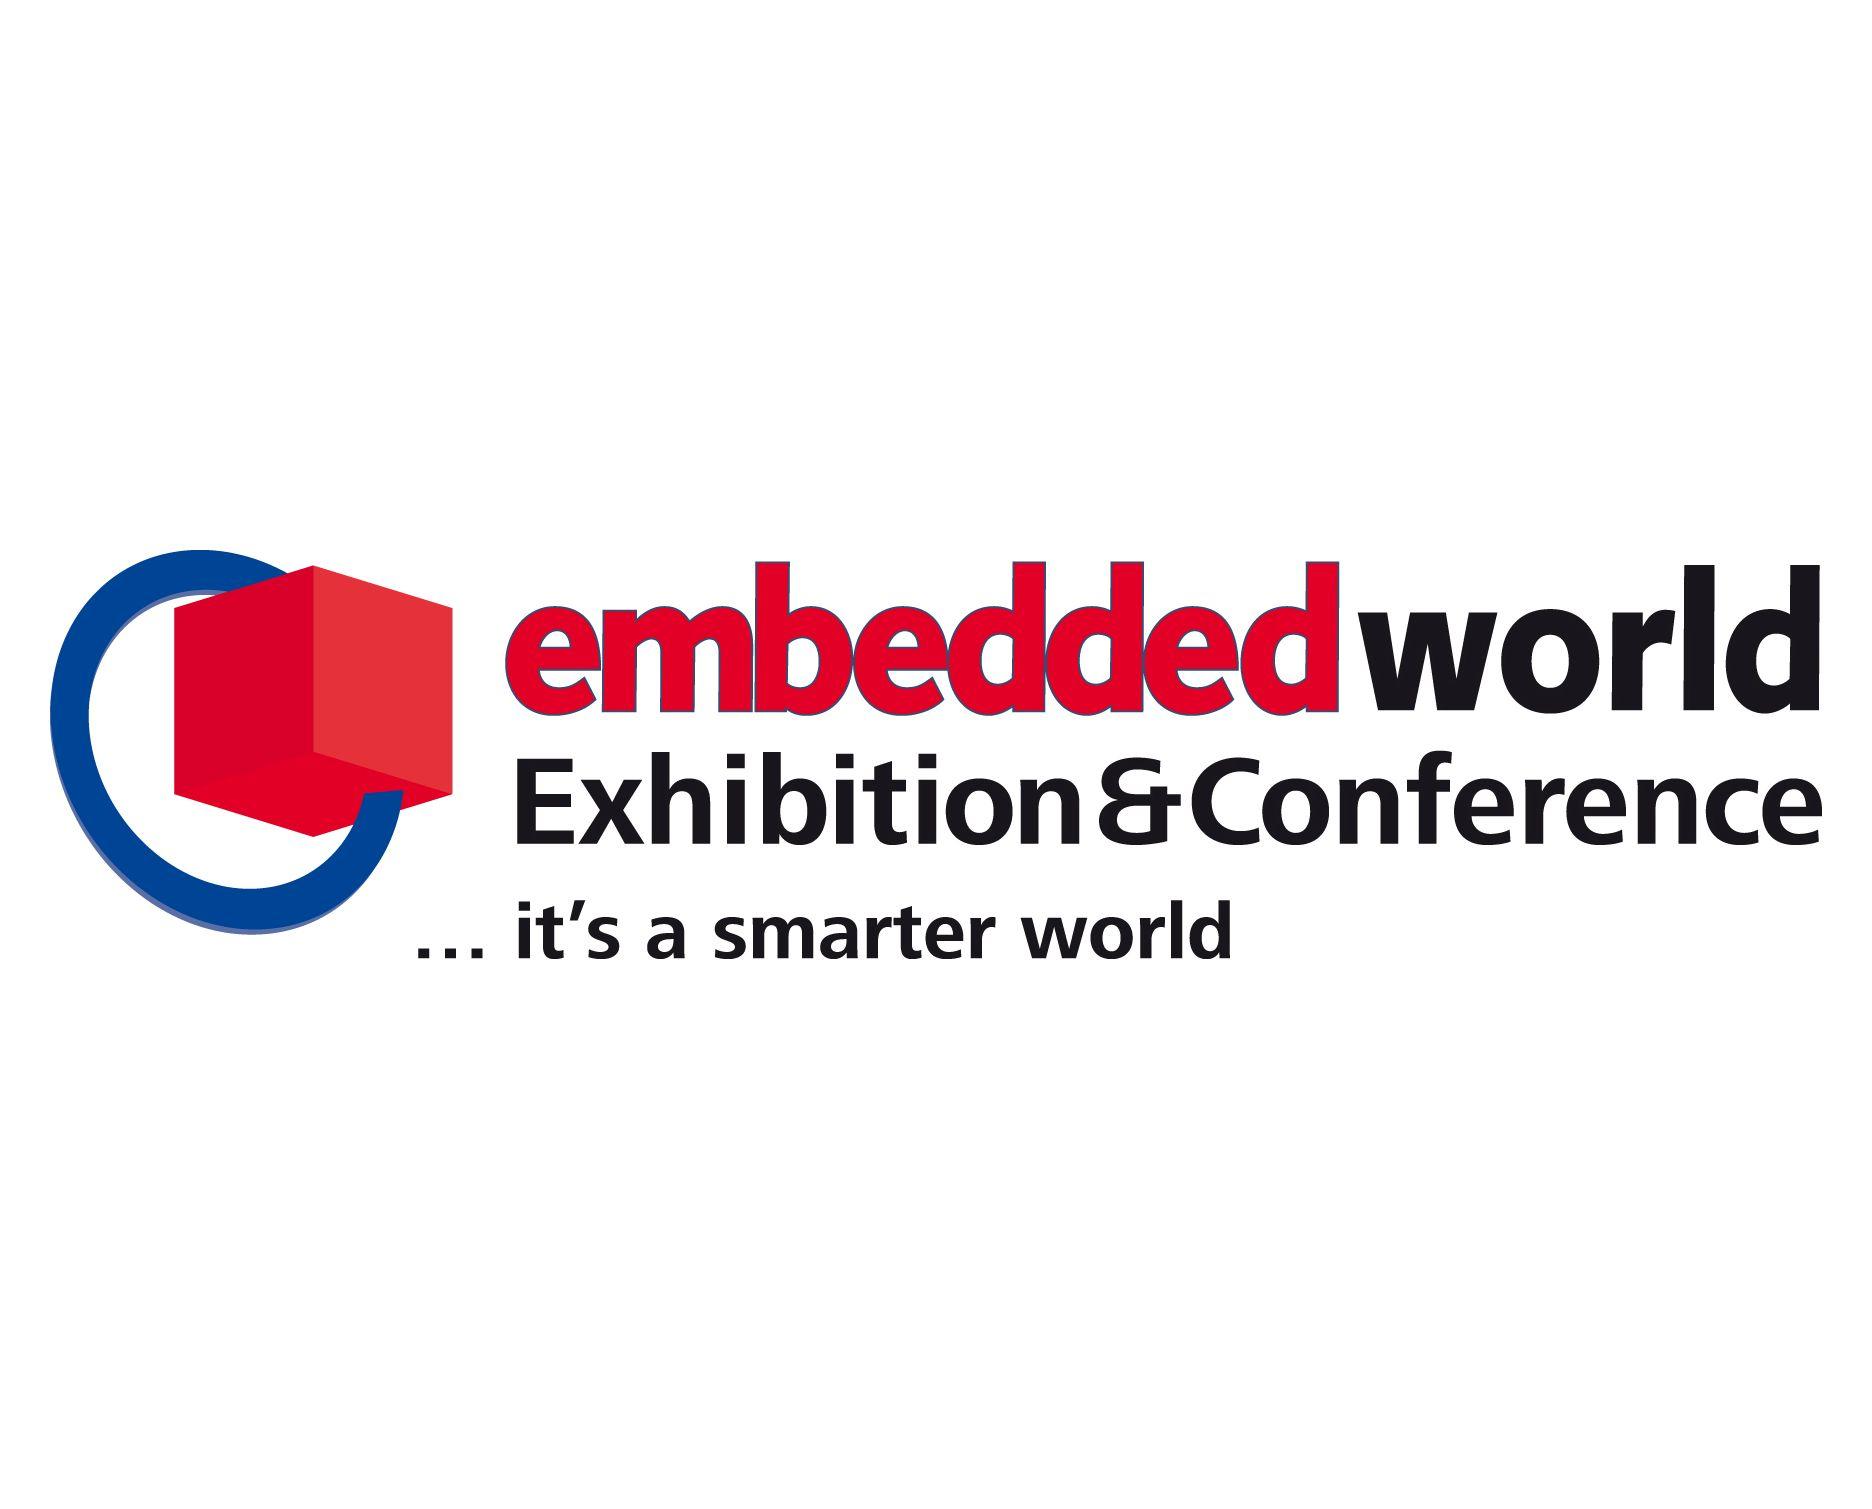 embeddedworld